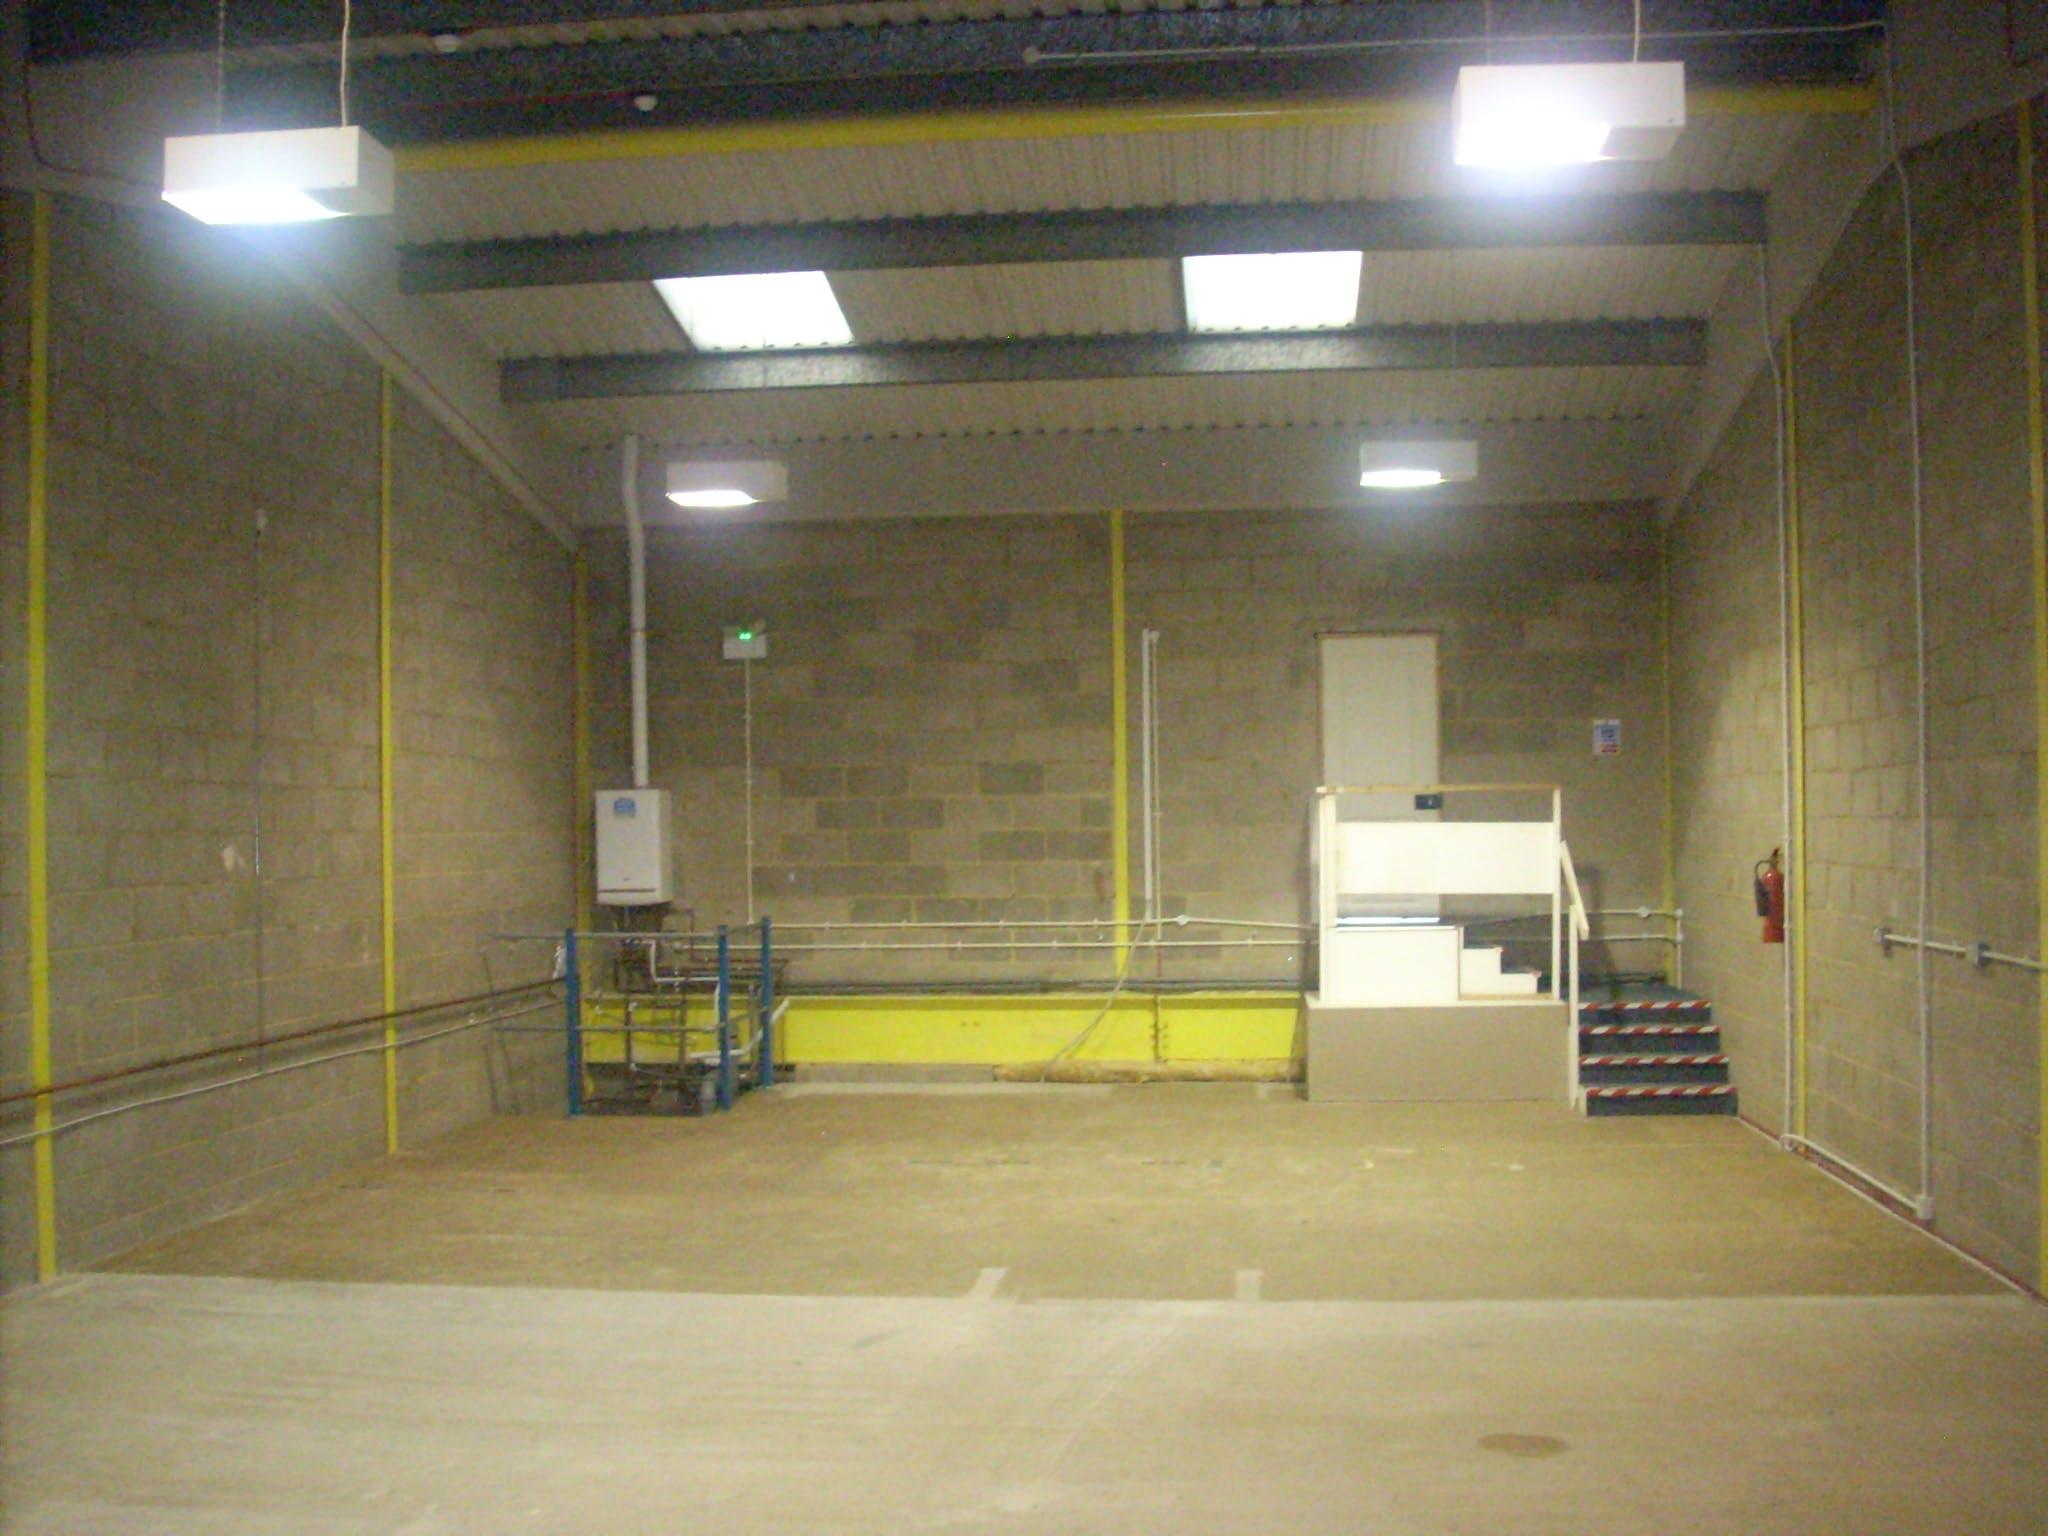 Unit 3, Brickfields Industrial Park, Kiln Lane, Bracknell, Industrial To Let - DSCN5635.JPG